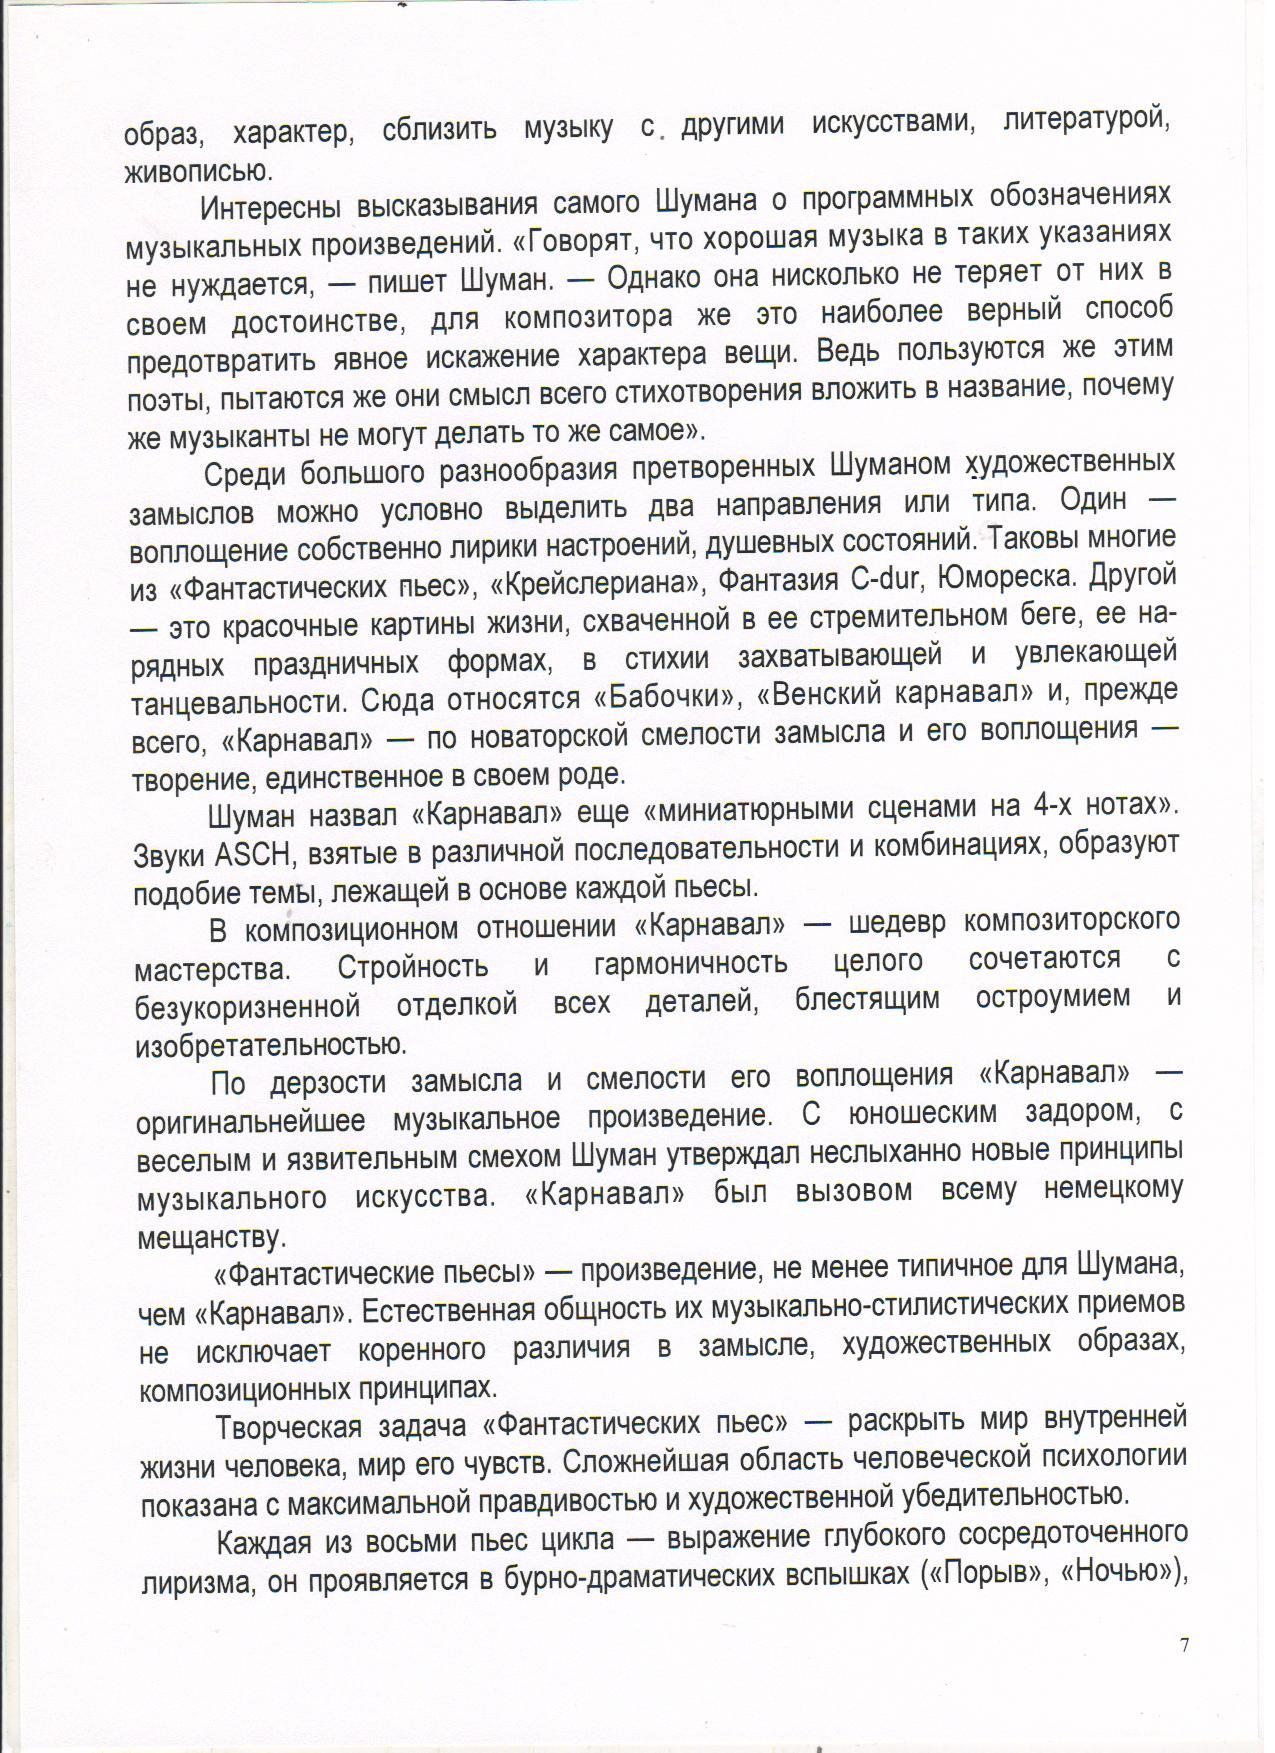 C:\Documents and Settings\Учитель\Рабочий стол\Шуман 7.jpg